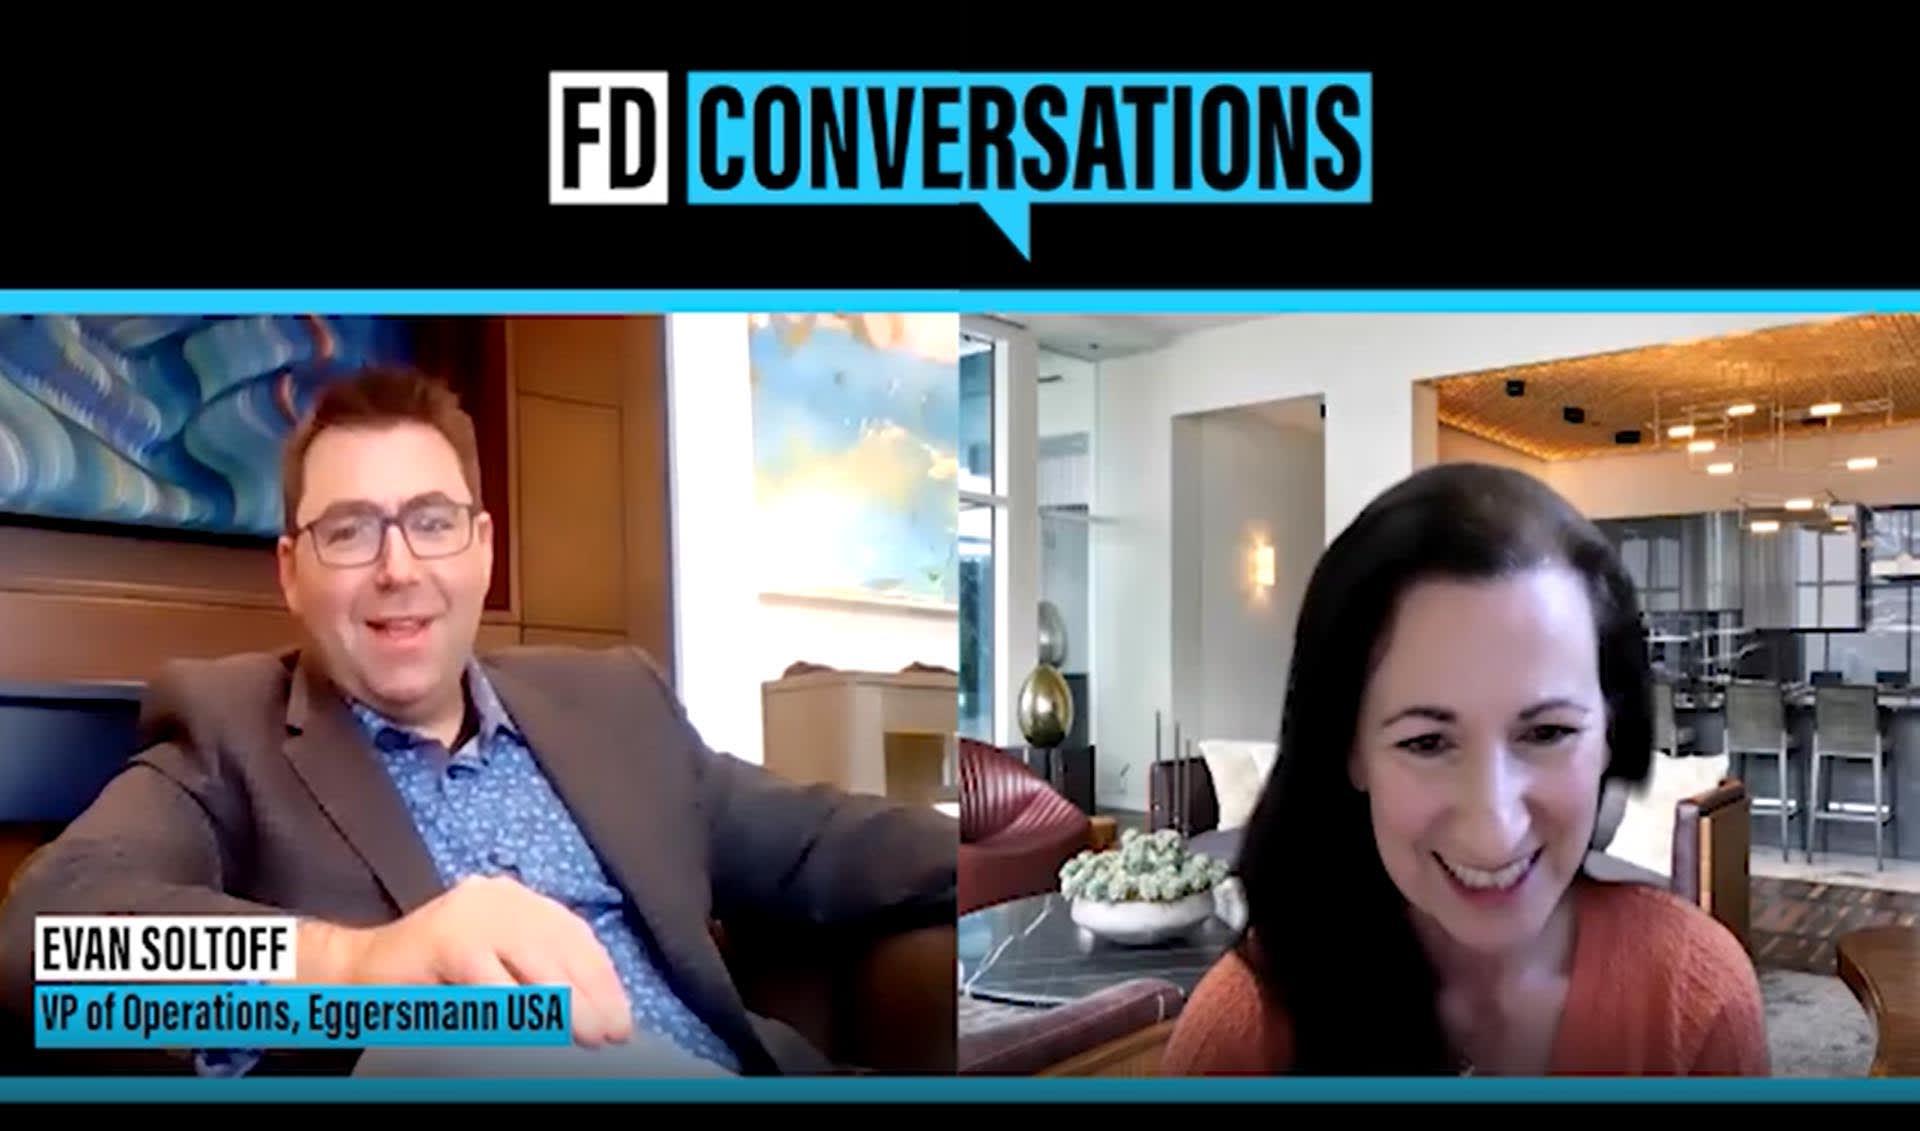 FD conversations